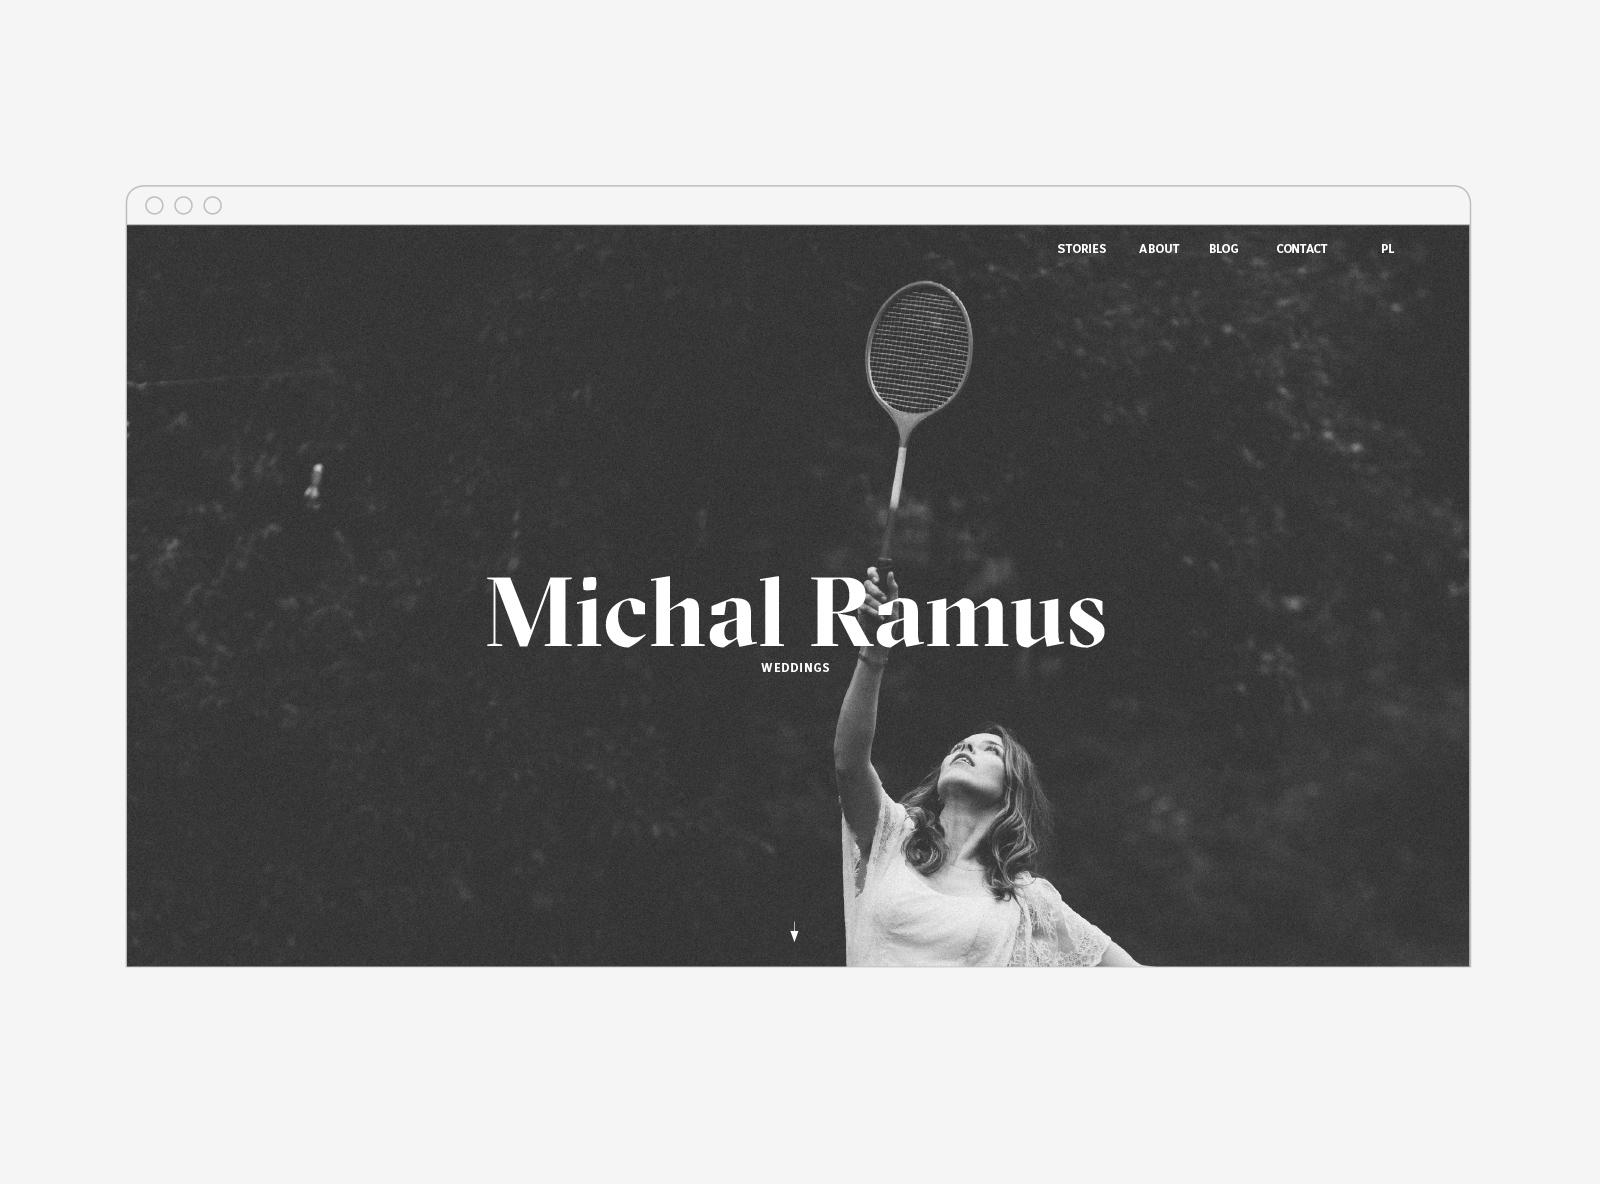 Michał Ramus